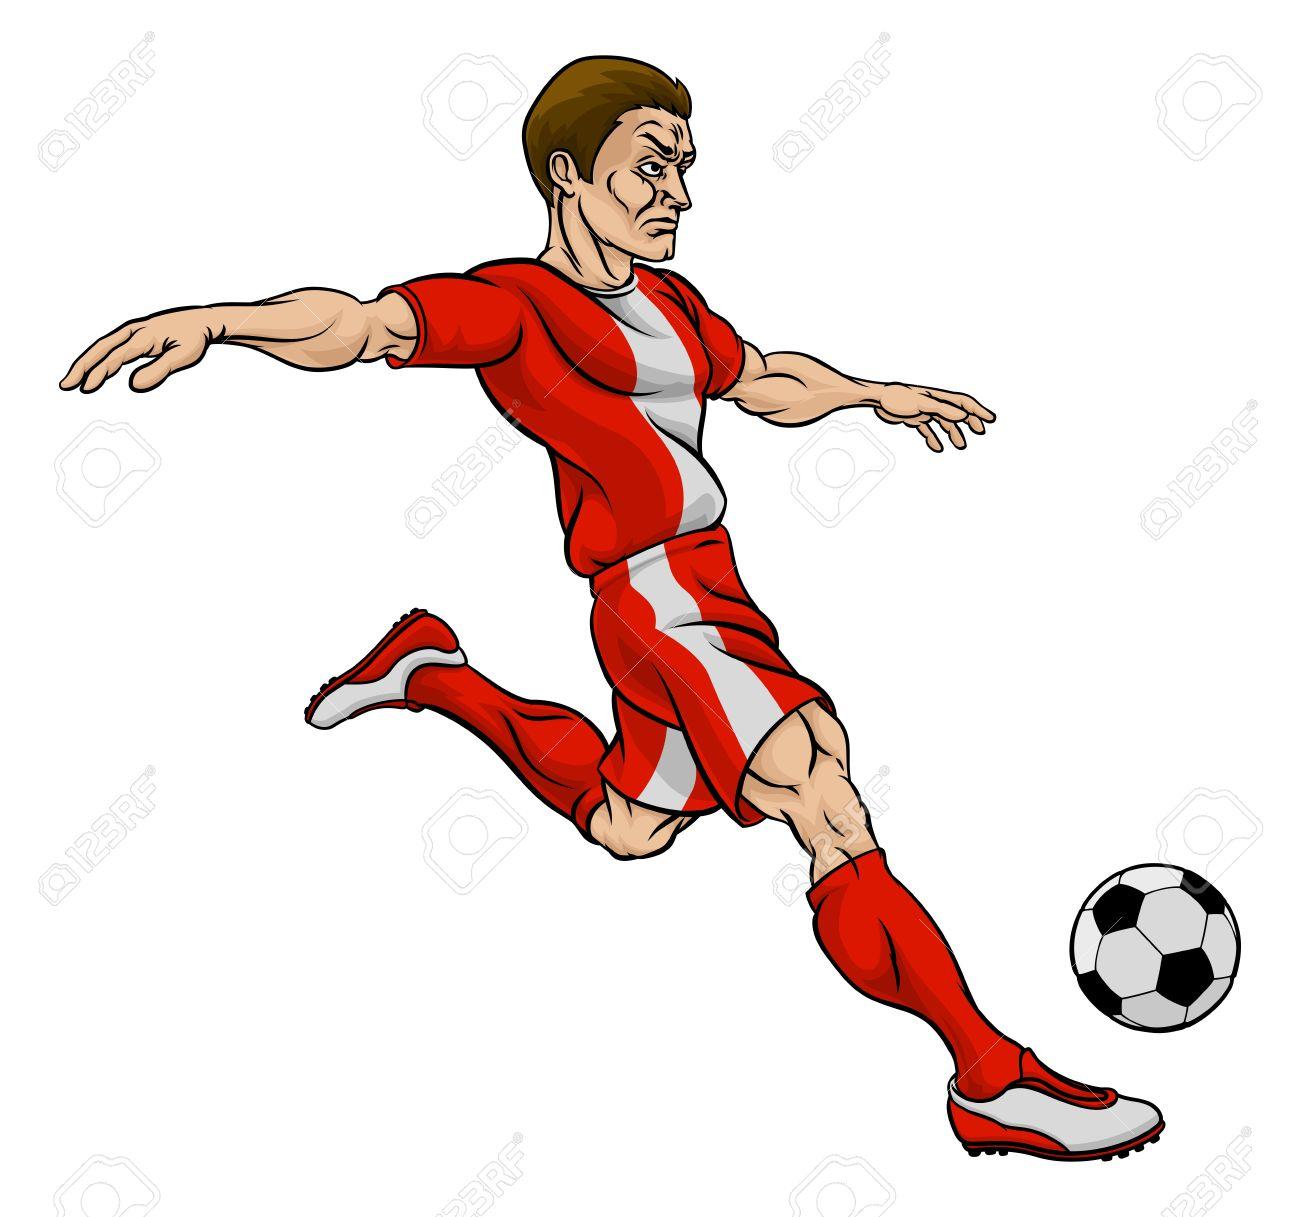 A Cartoon Football Soccer Player Charact-A cartoon football soccer player character kicking the ball Stock Vector -  66013531-2